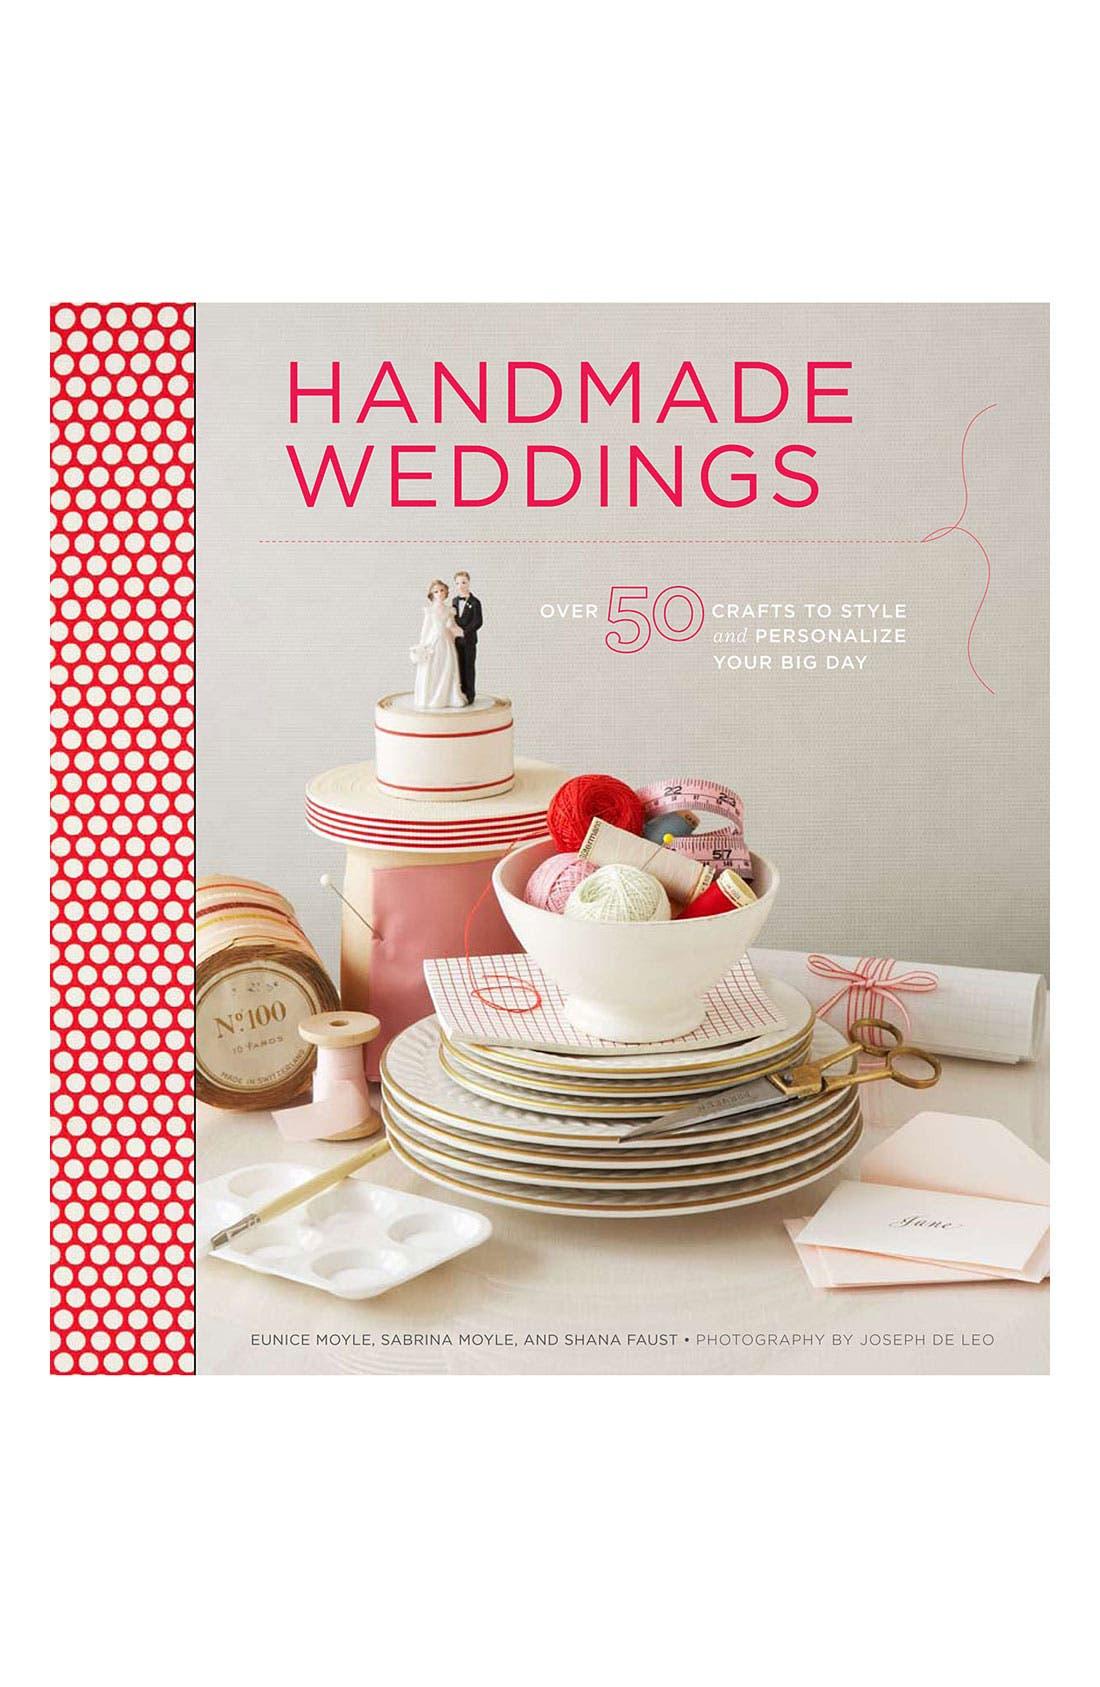 Alternate Image 1 Selected - 'Handmade Weddings' Book